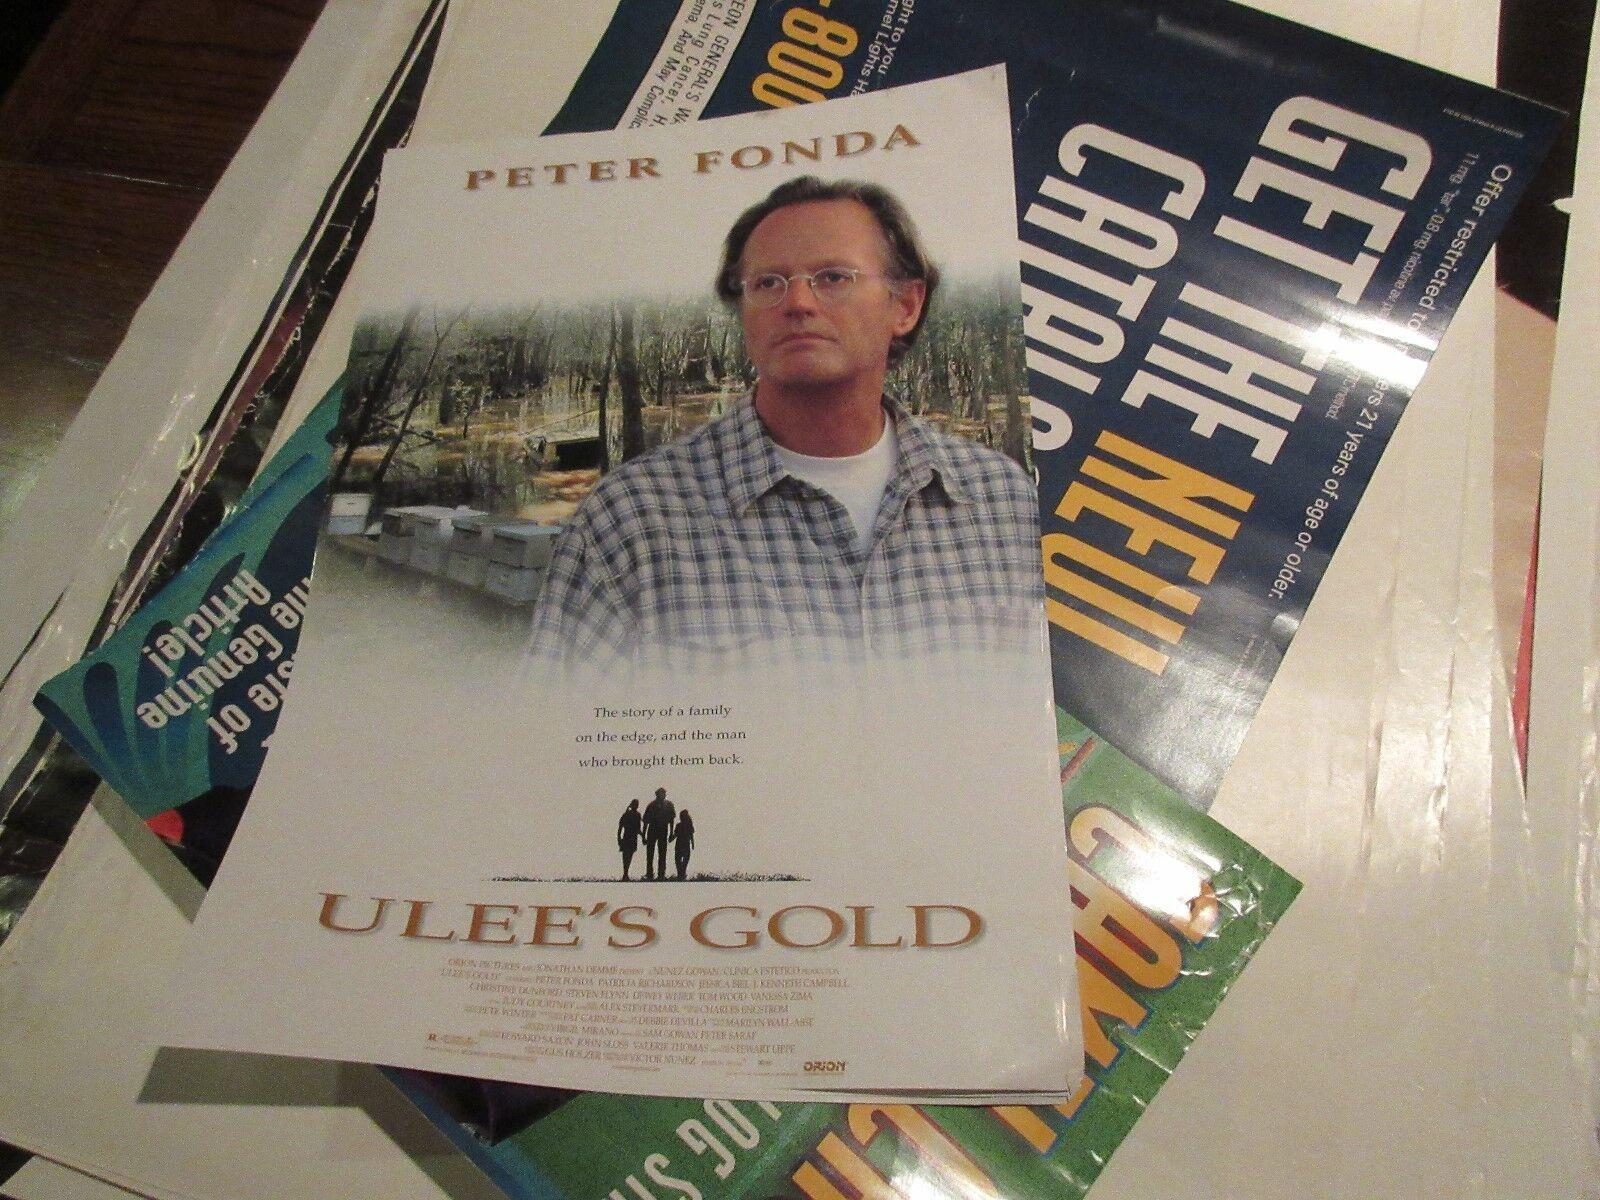 "Ulee's Gold , POSTER , Peter Fonda , 1997 , 13 1/2"" X 1"